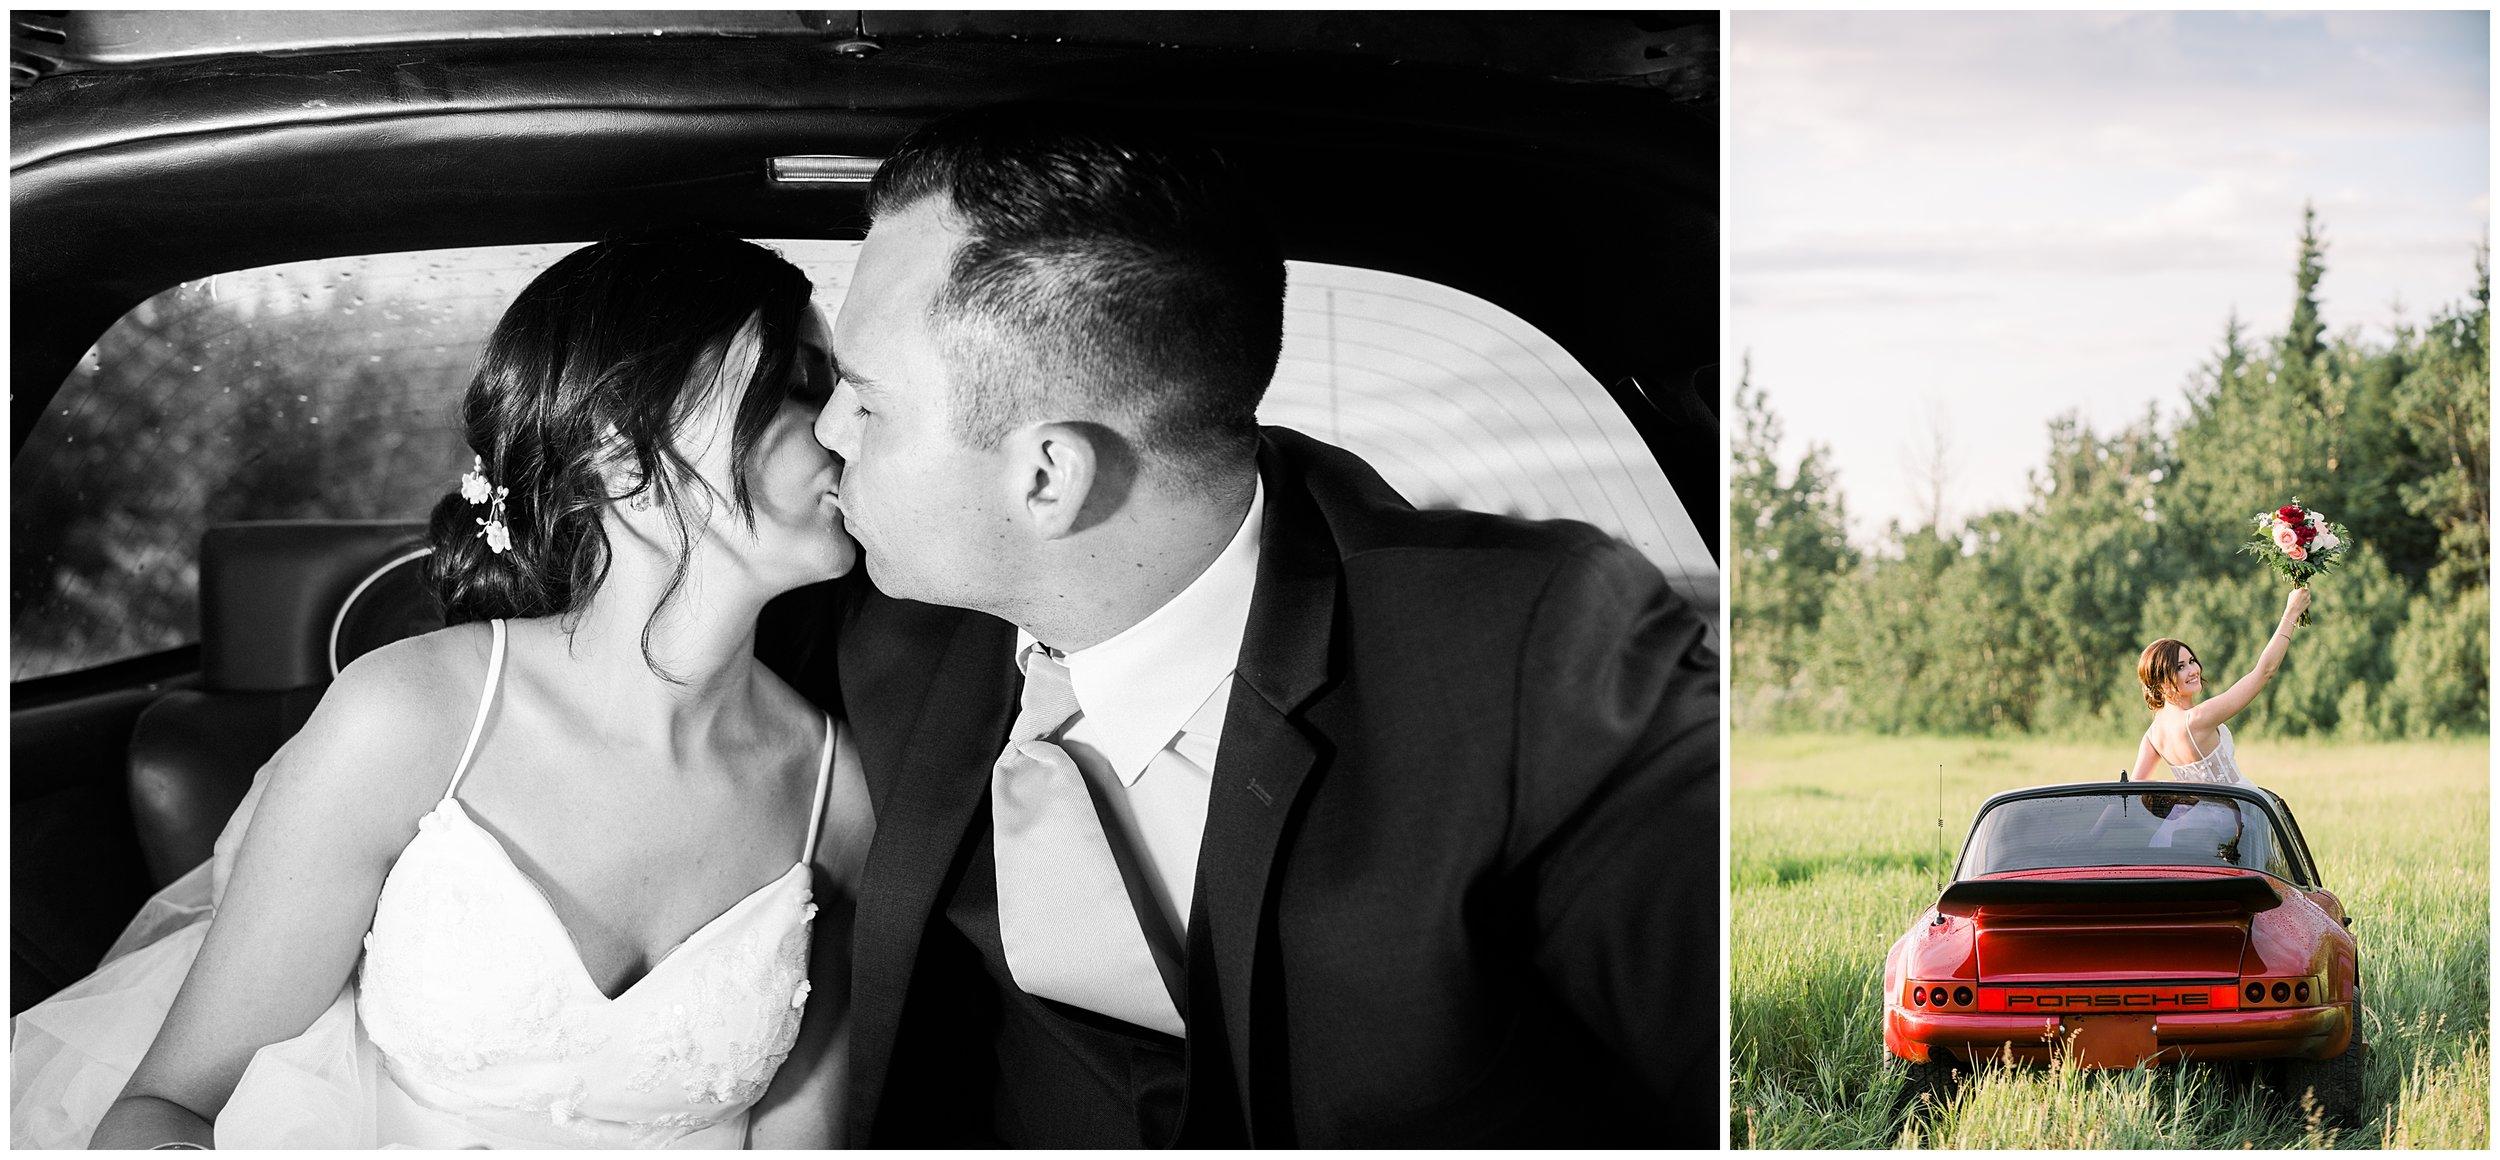 Alyssa-Poland-Photography_0642_alberta wedding.jpg